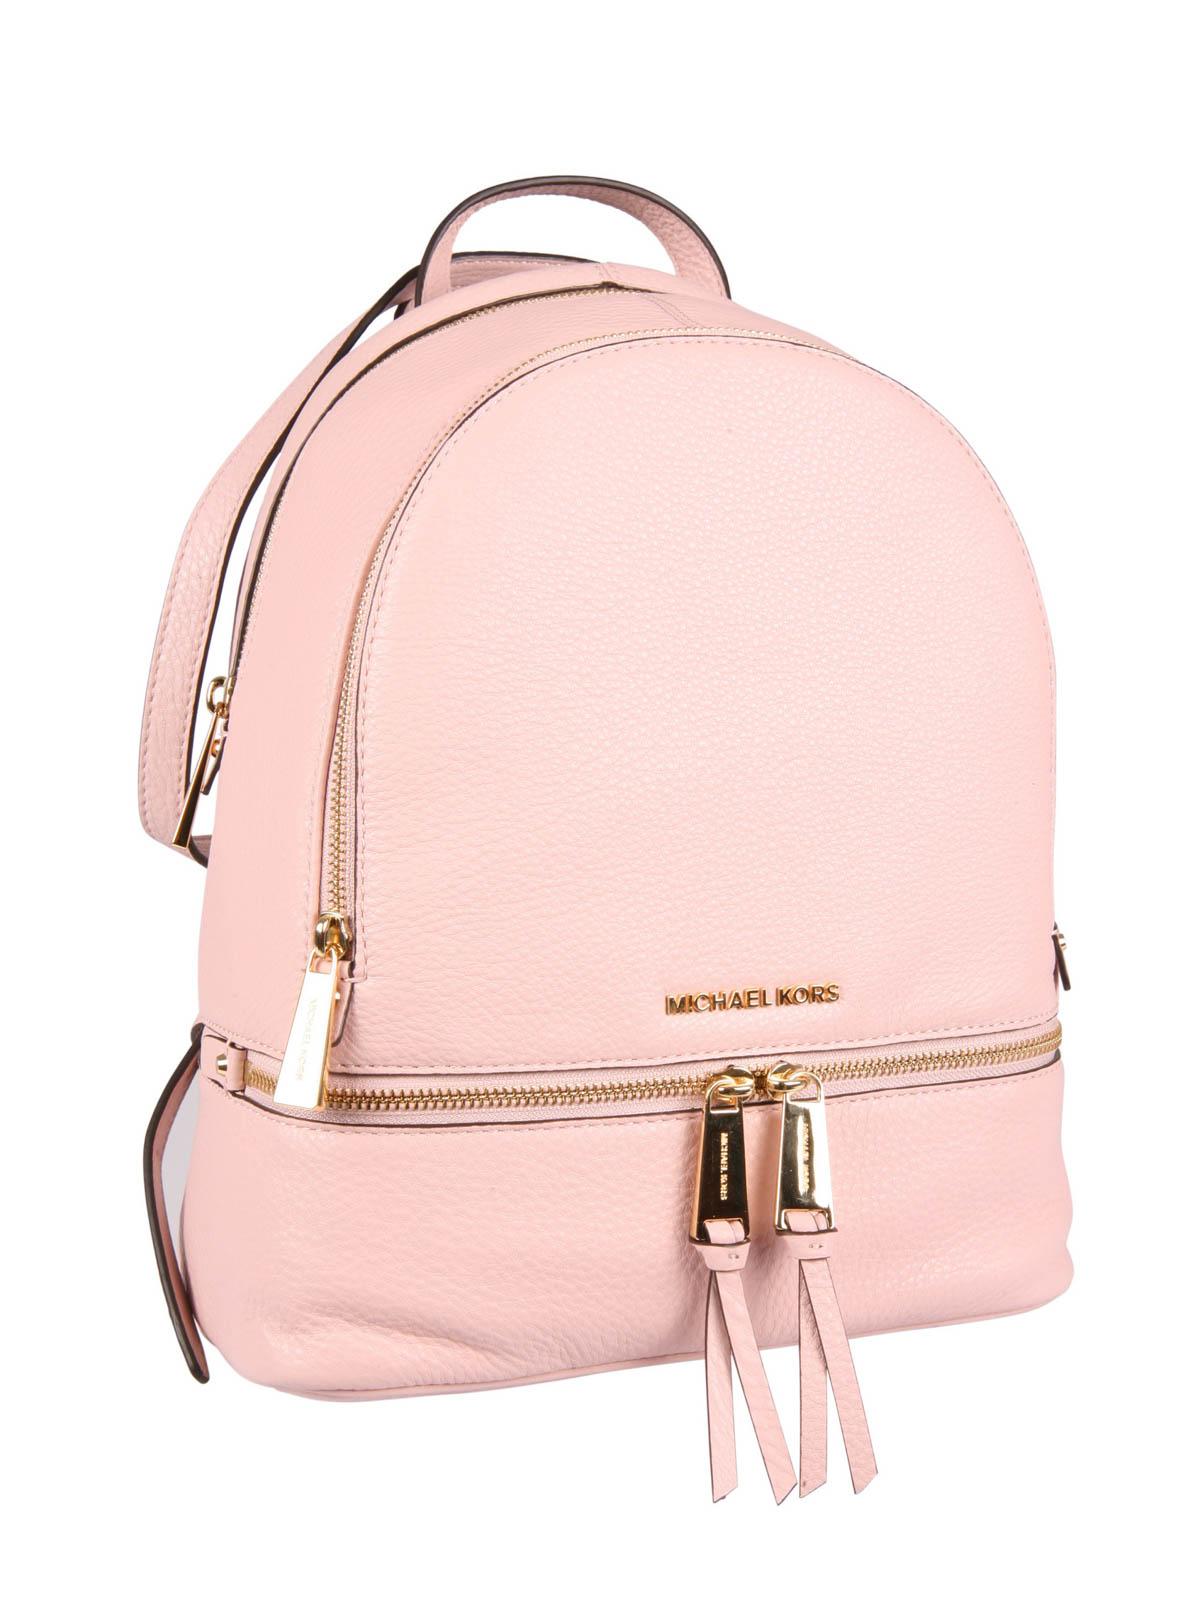 l'ultimo c122d abfdb Michael Kors - Rhea backpack - backpacks - 30S5GEZB1L 656